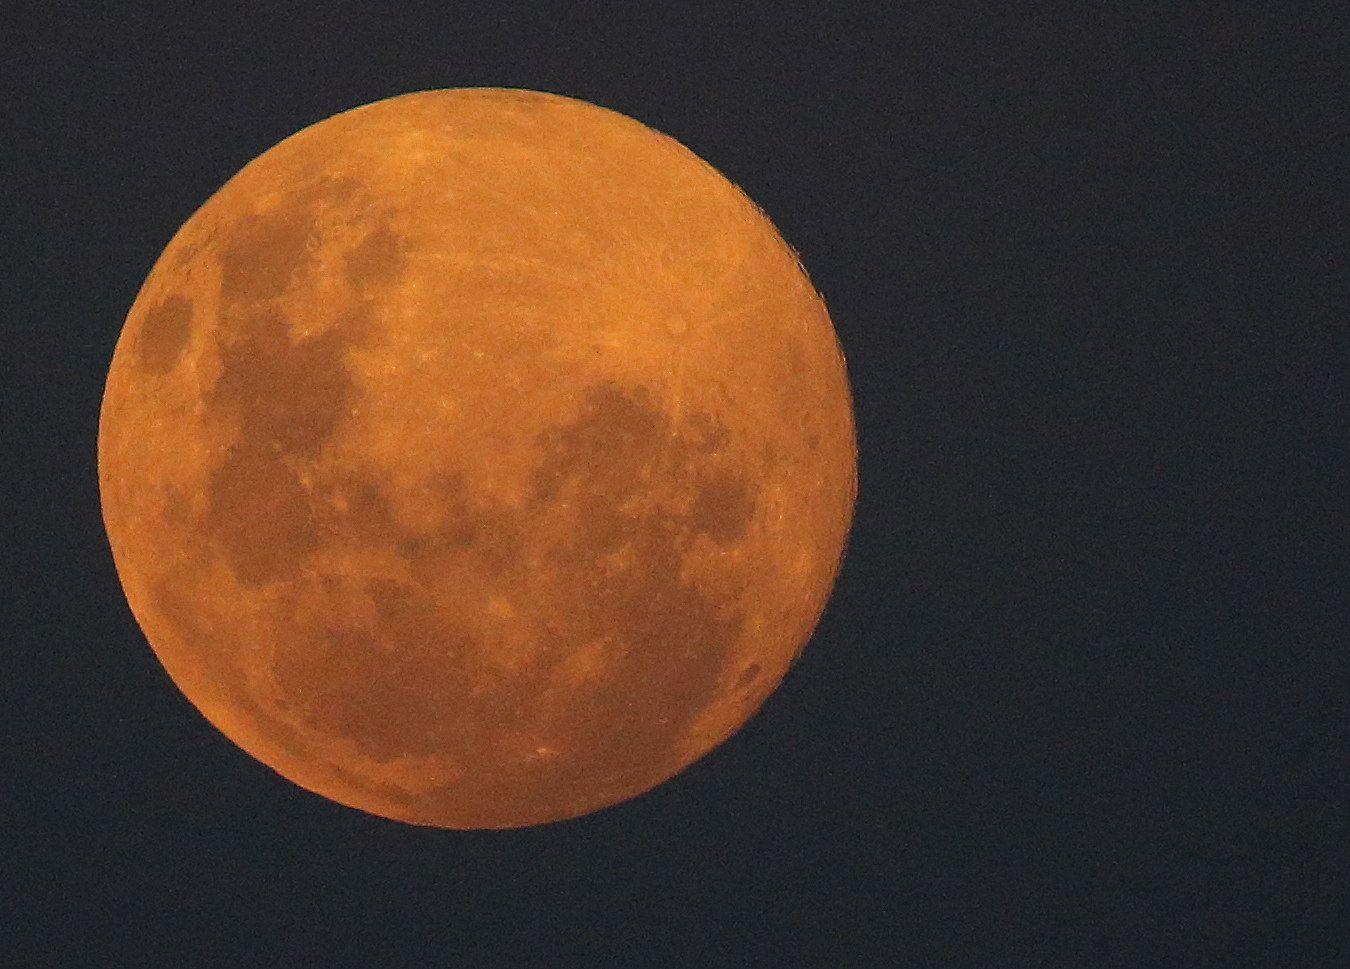 Super full moon seen (109387712).jpg